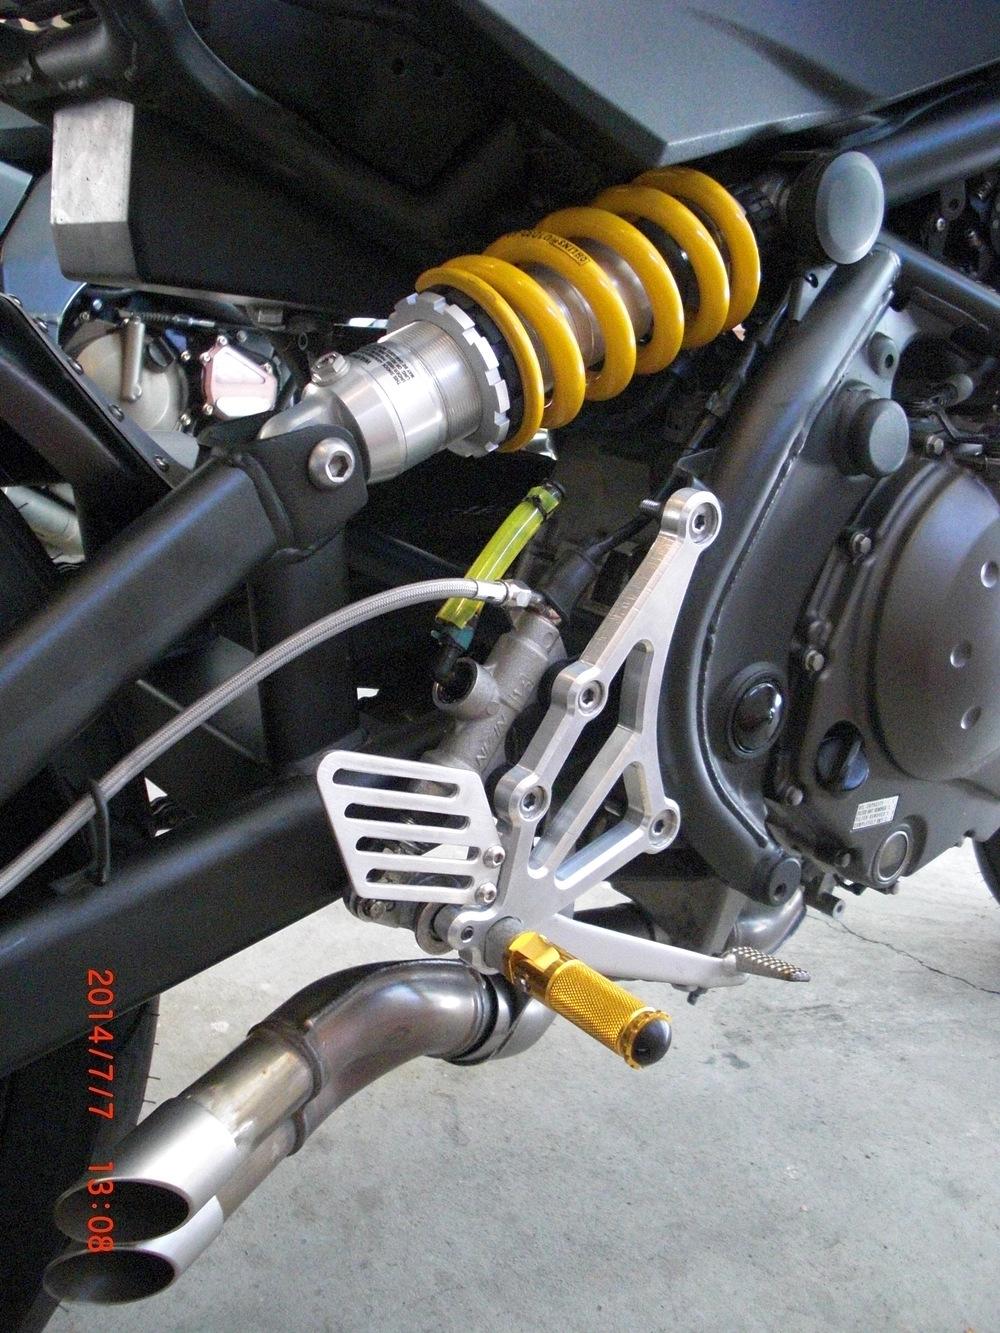 Kawasaki Ninja 650R Rearset